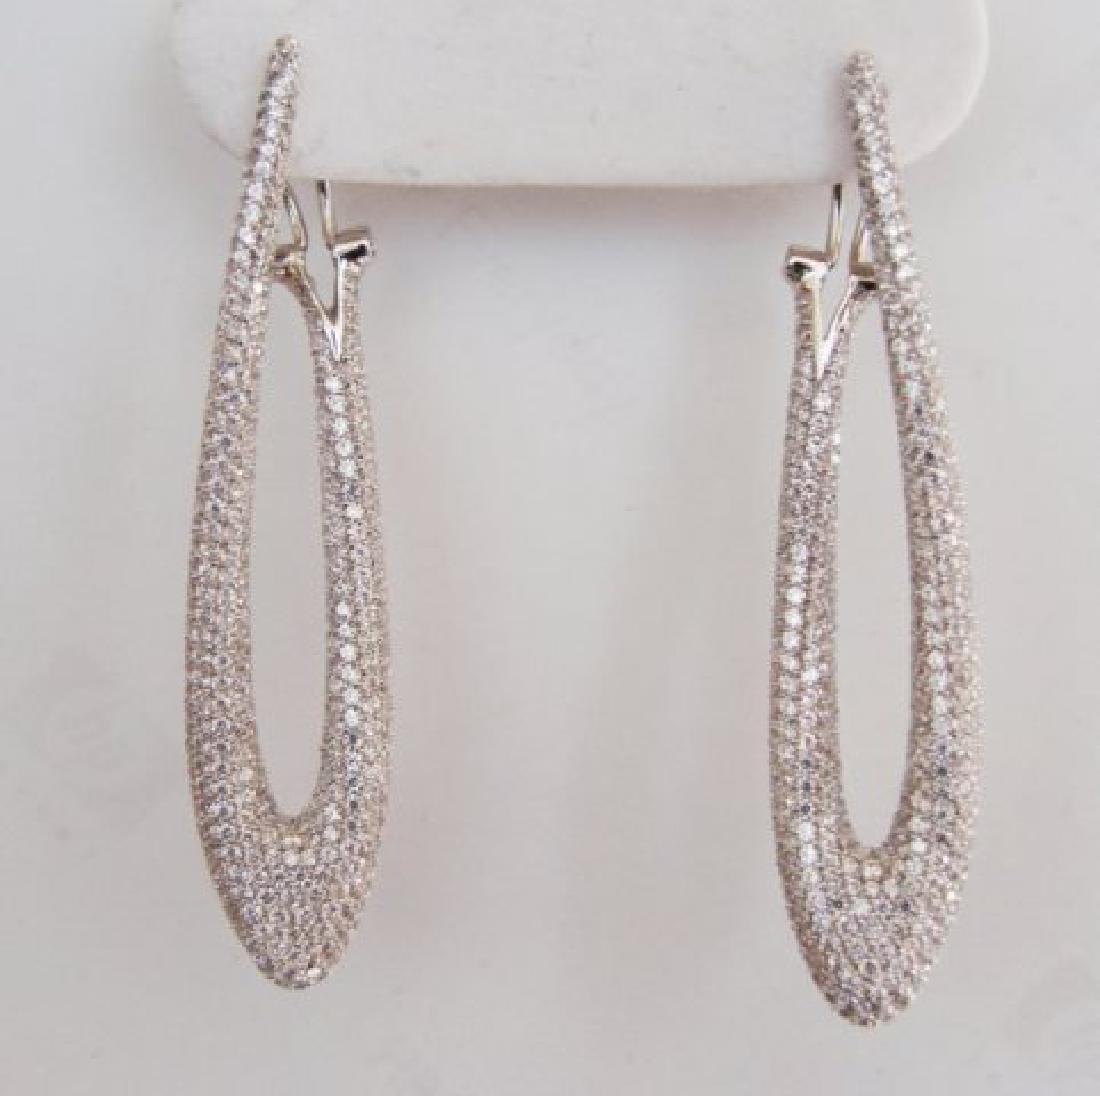 Creation Diamond Chandeliers Ear 4.85Ct 18k W/g Overlay